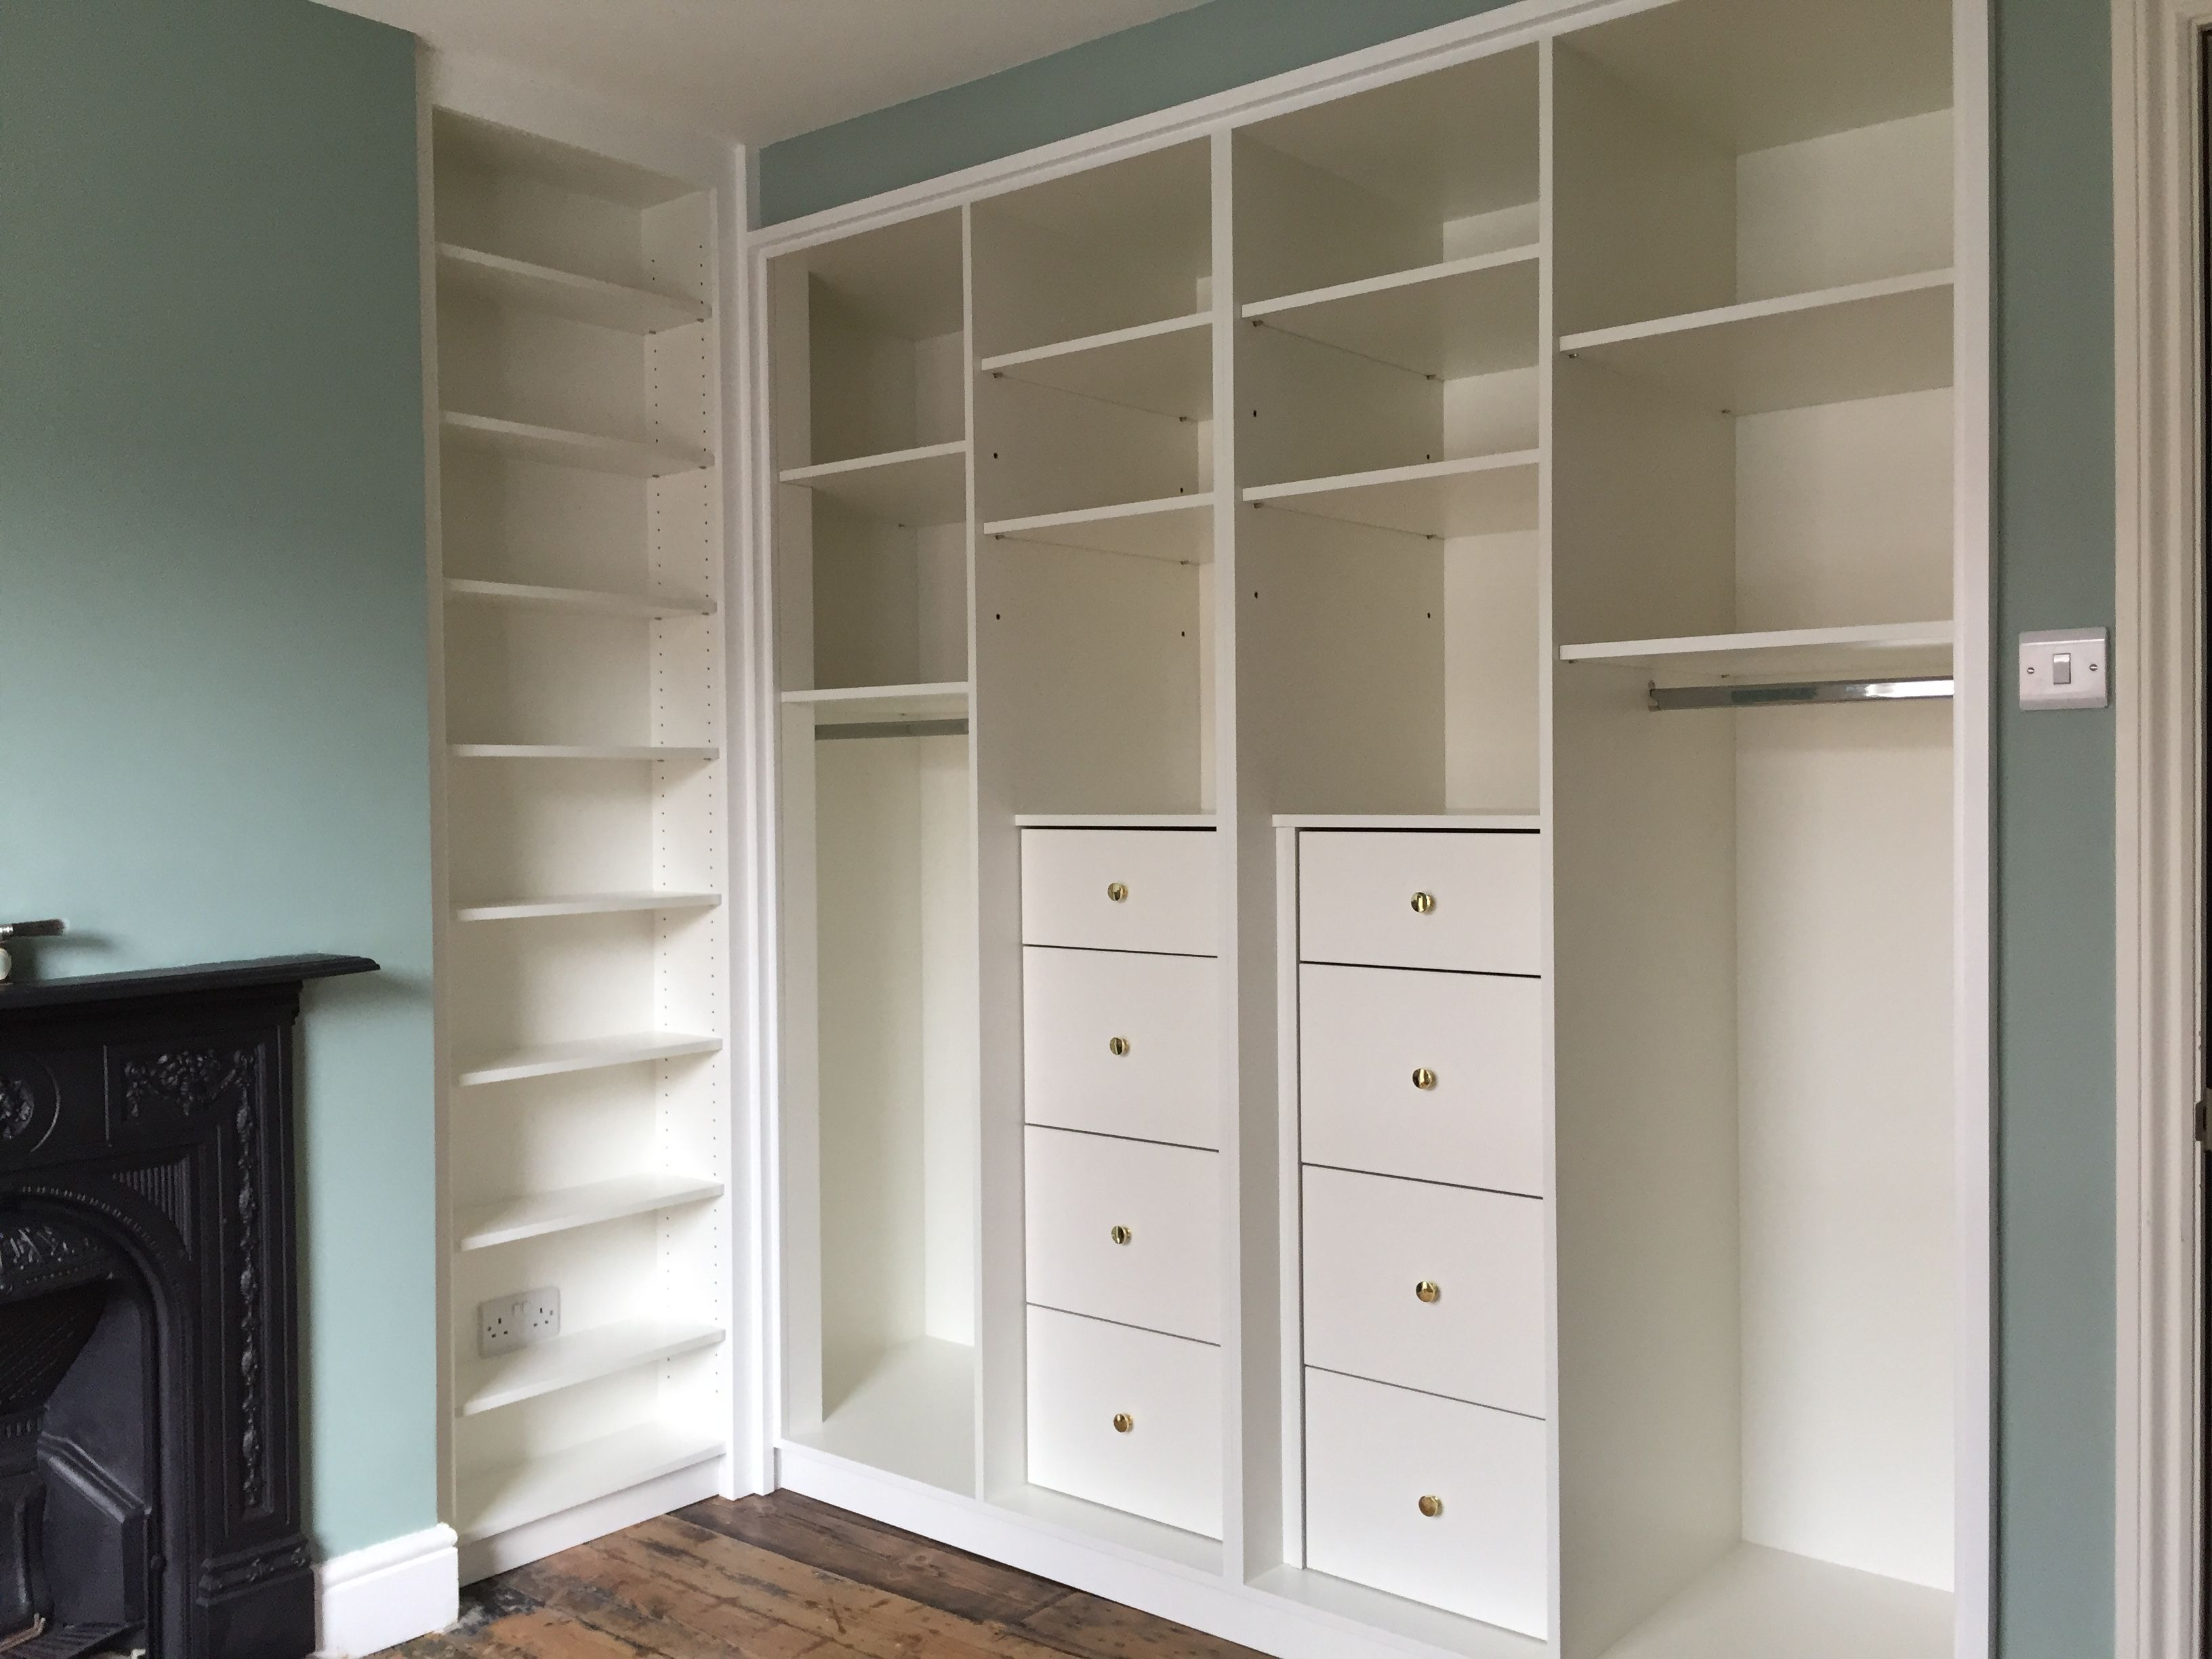 Bespoke Wardrobes by Mark McEvoy Interiors Carpentry and